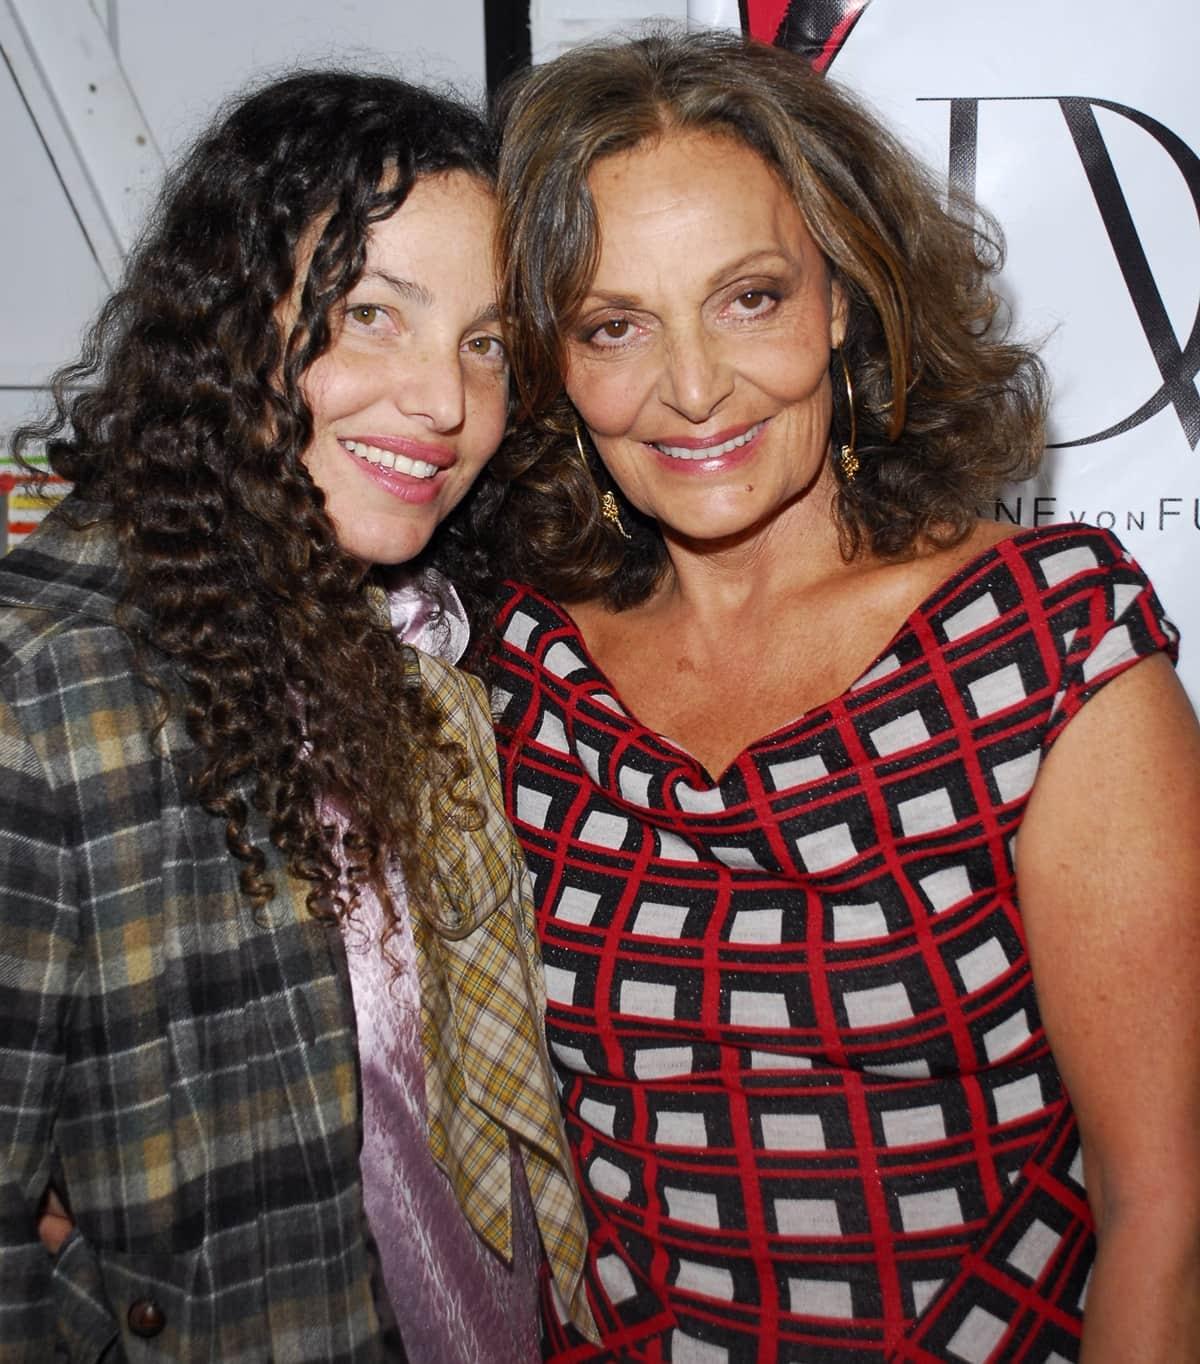 American art curator Tatiana von Fürstenberg with her mother Diane von Fürstenberg, who was born Diane Simone Michele Halfin